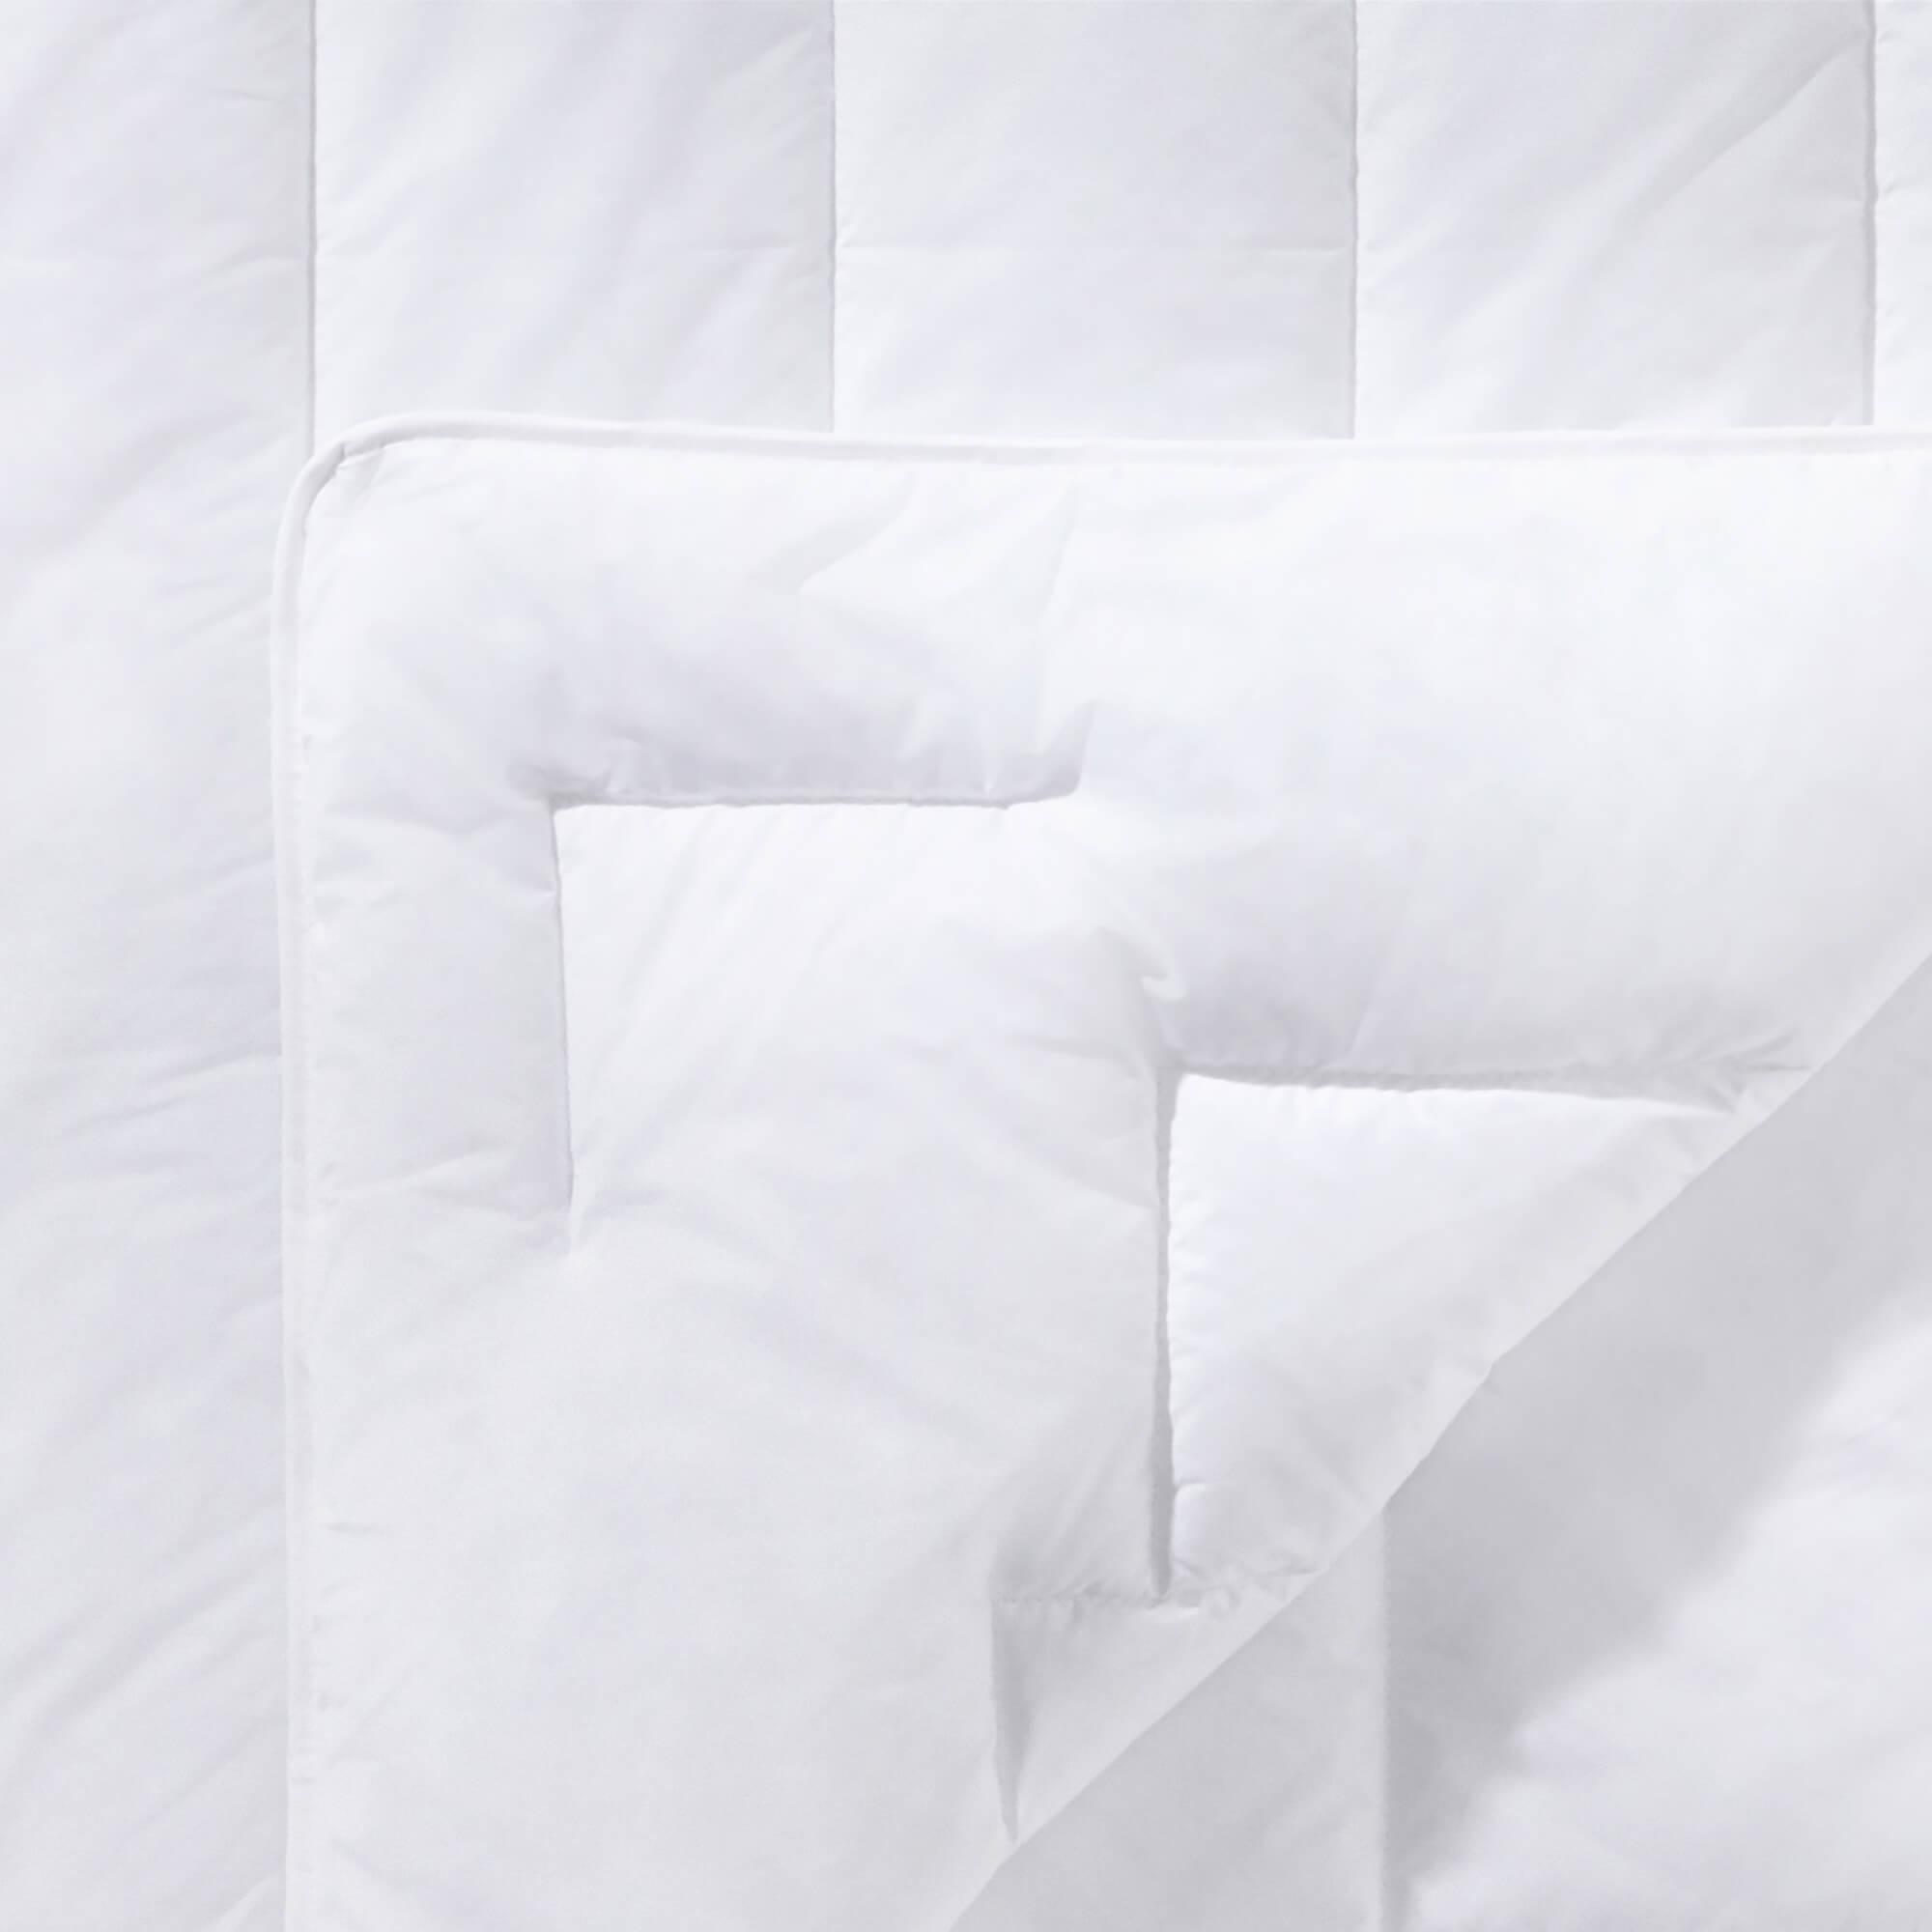 Faserdecke Premium Sommerbettdecke schlafgut 200x200cm